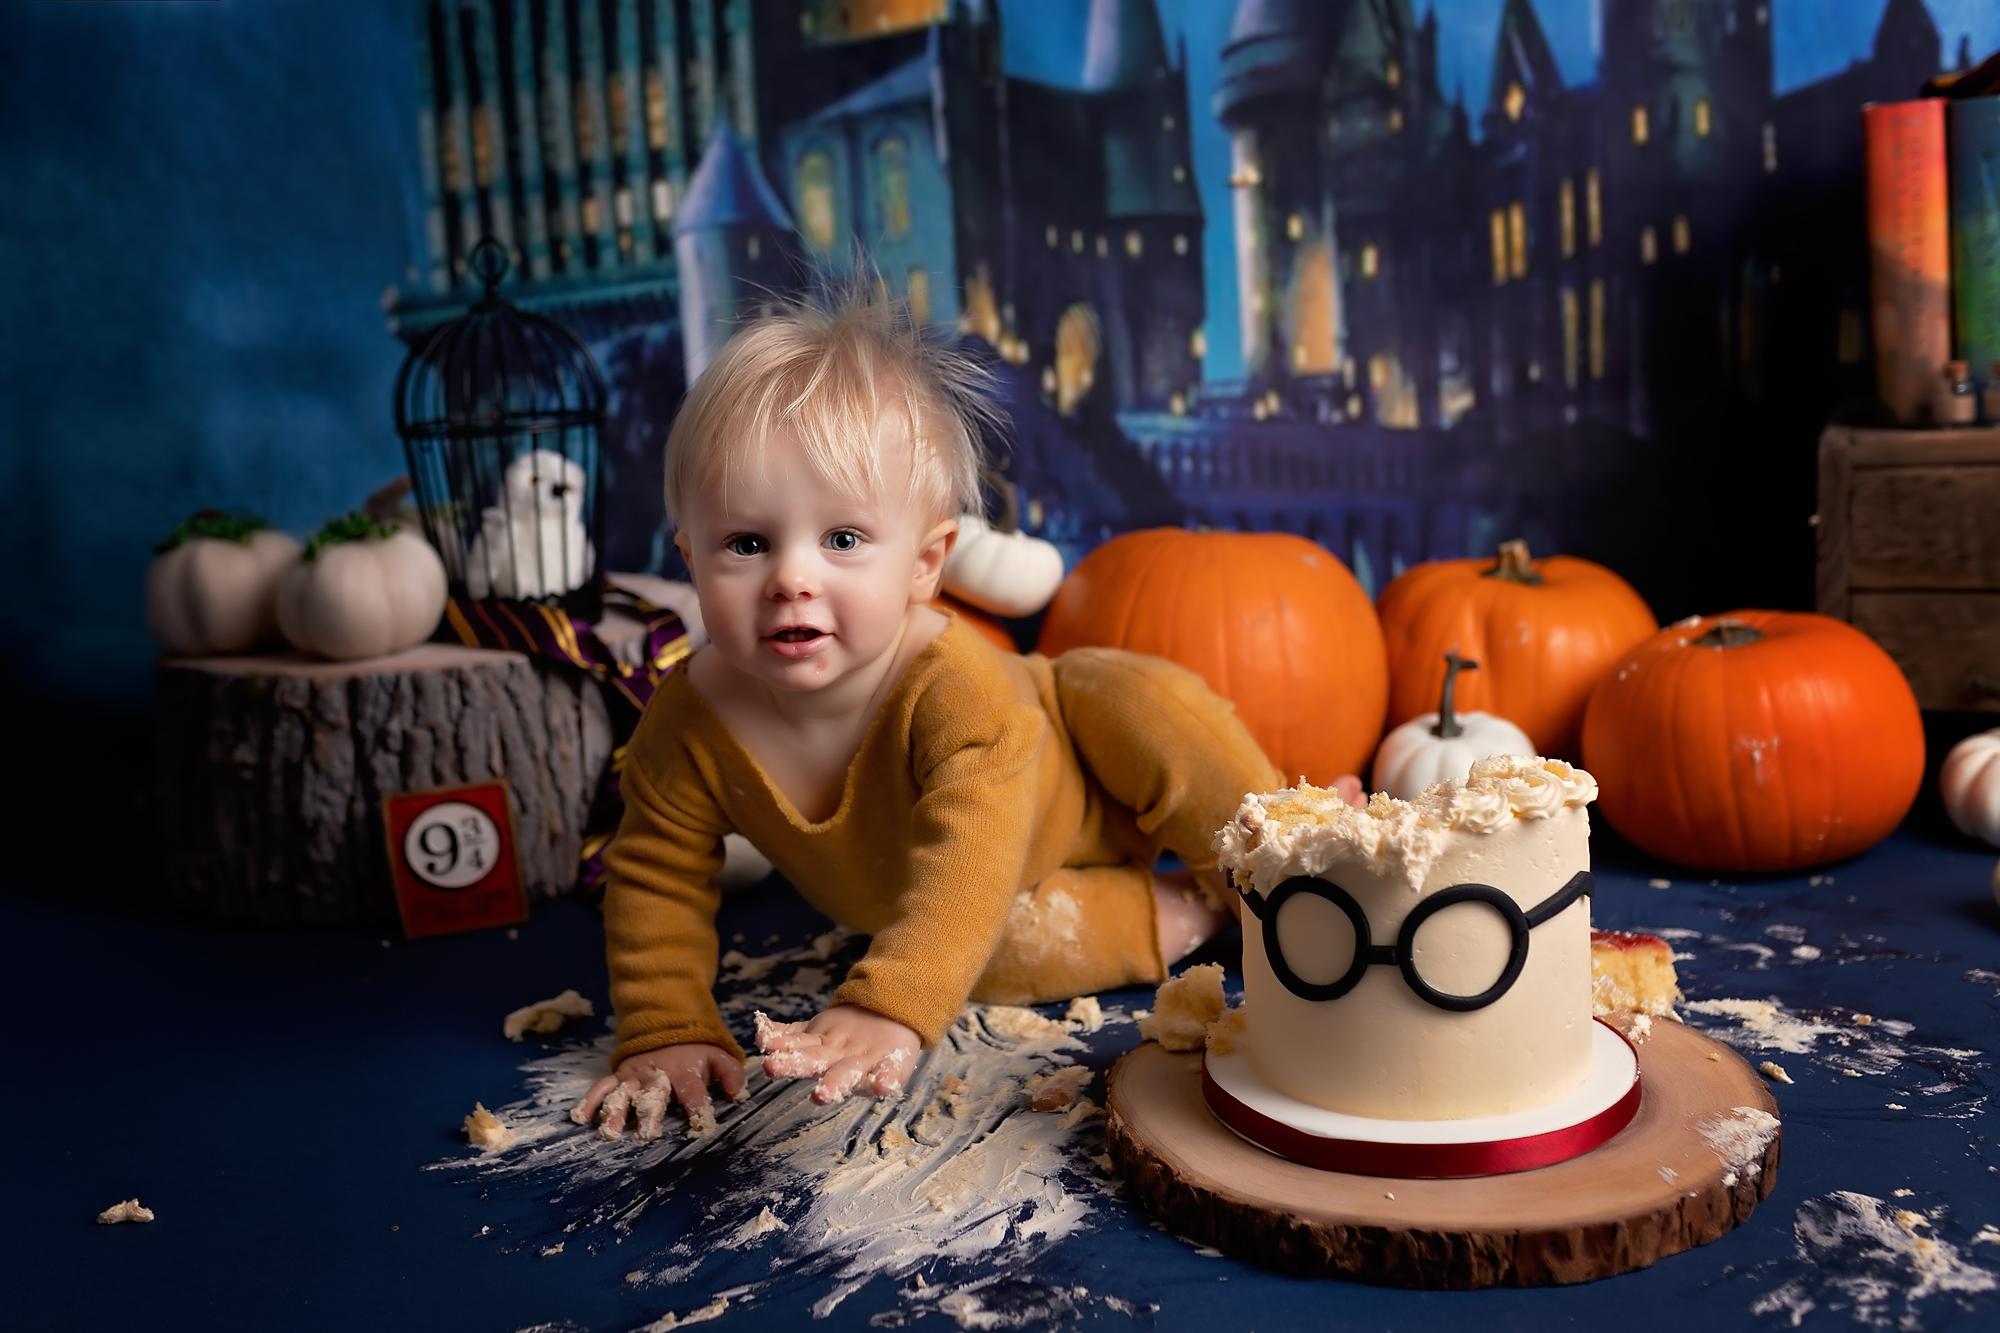 Harry Potter cake smash session in York